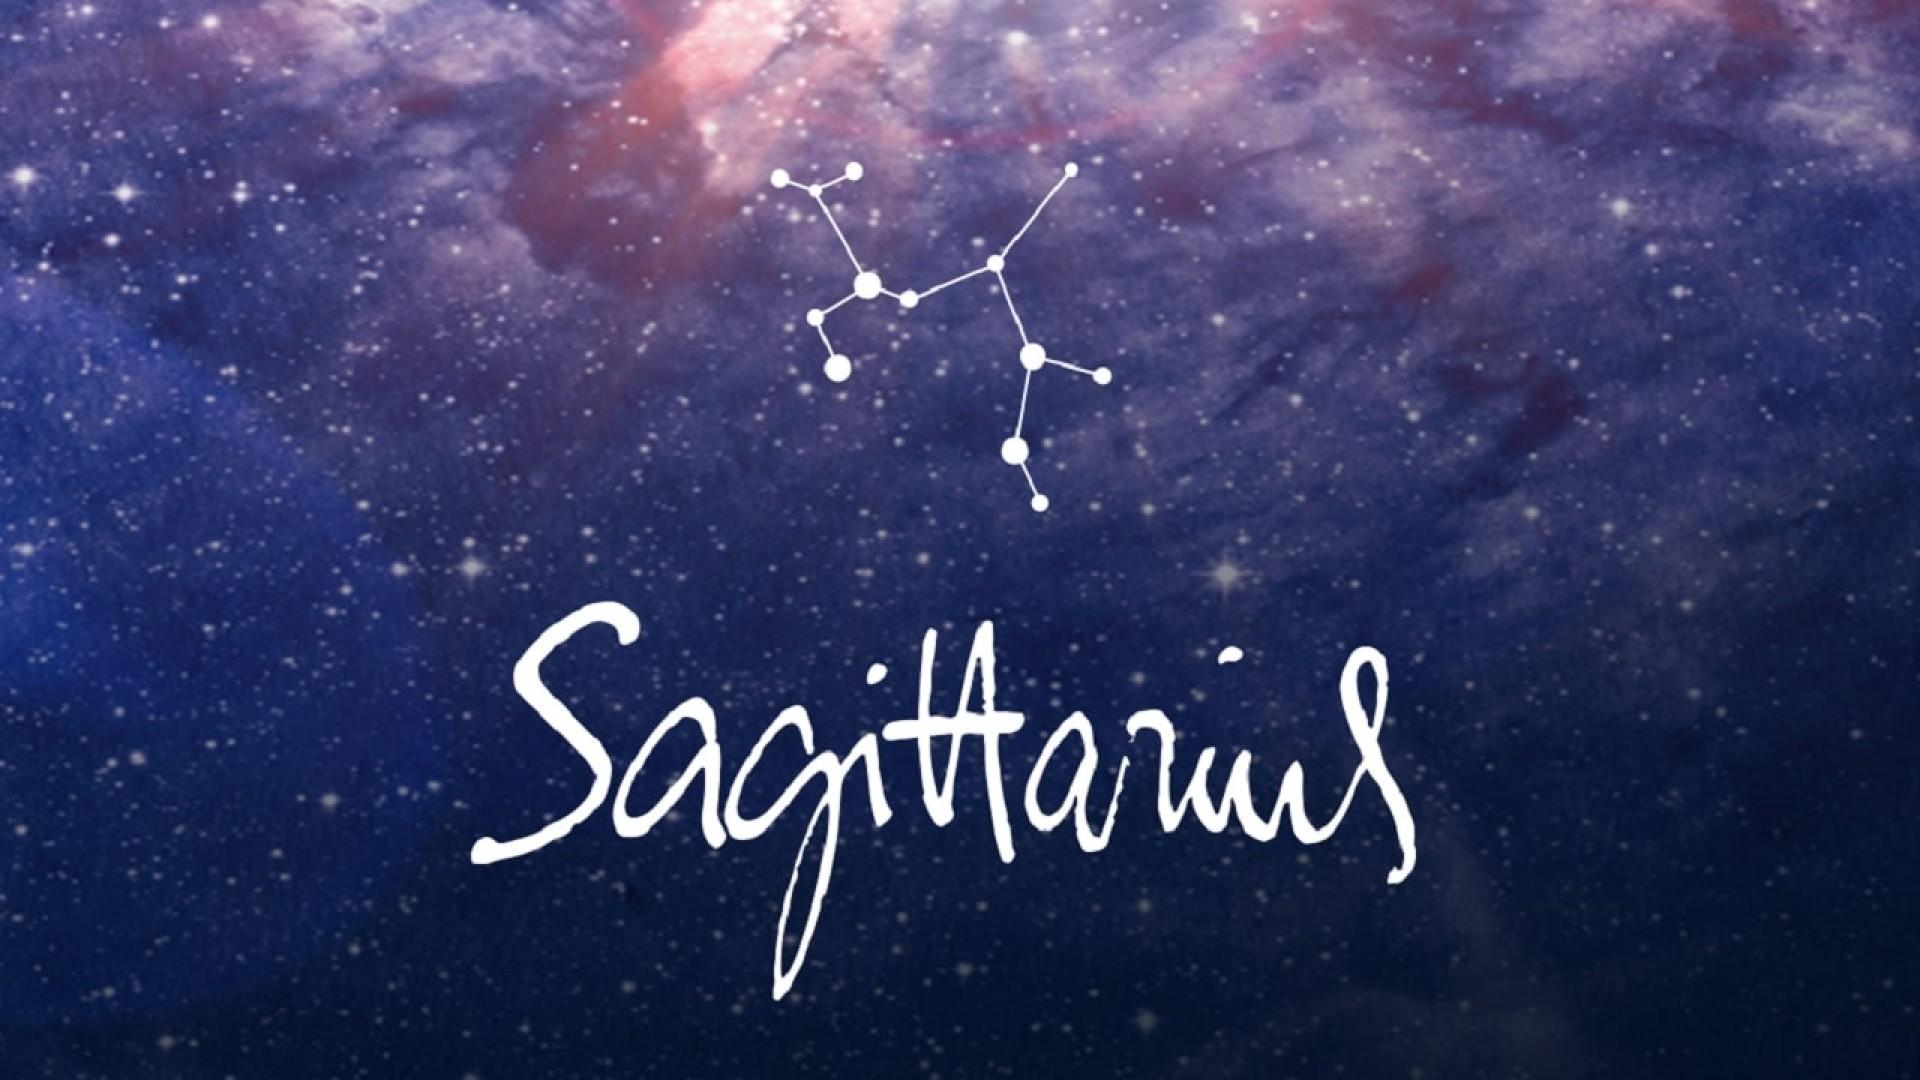 Sagittarius computer wallpaper